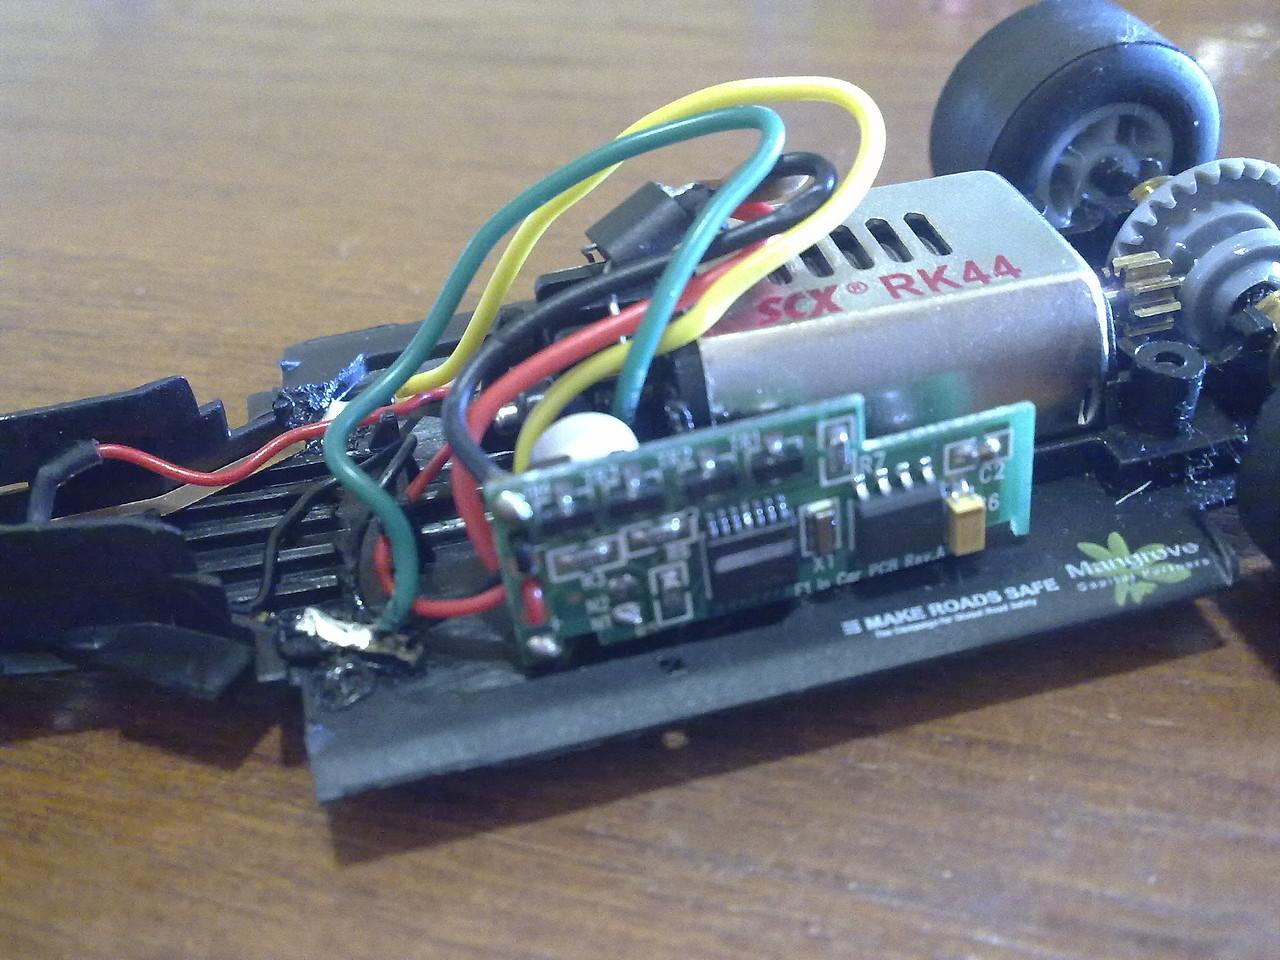 Digitalizar renault f 1 kubika de scx a ssd slot sport digital - Scalextric sport digital console ...